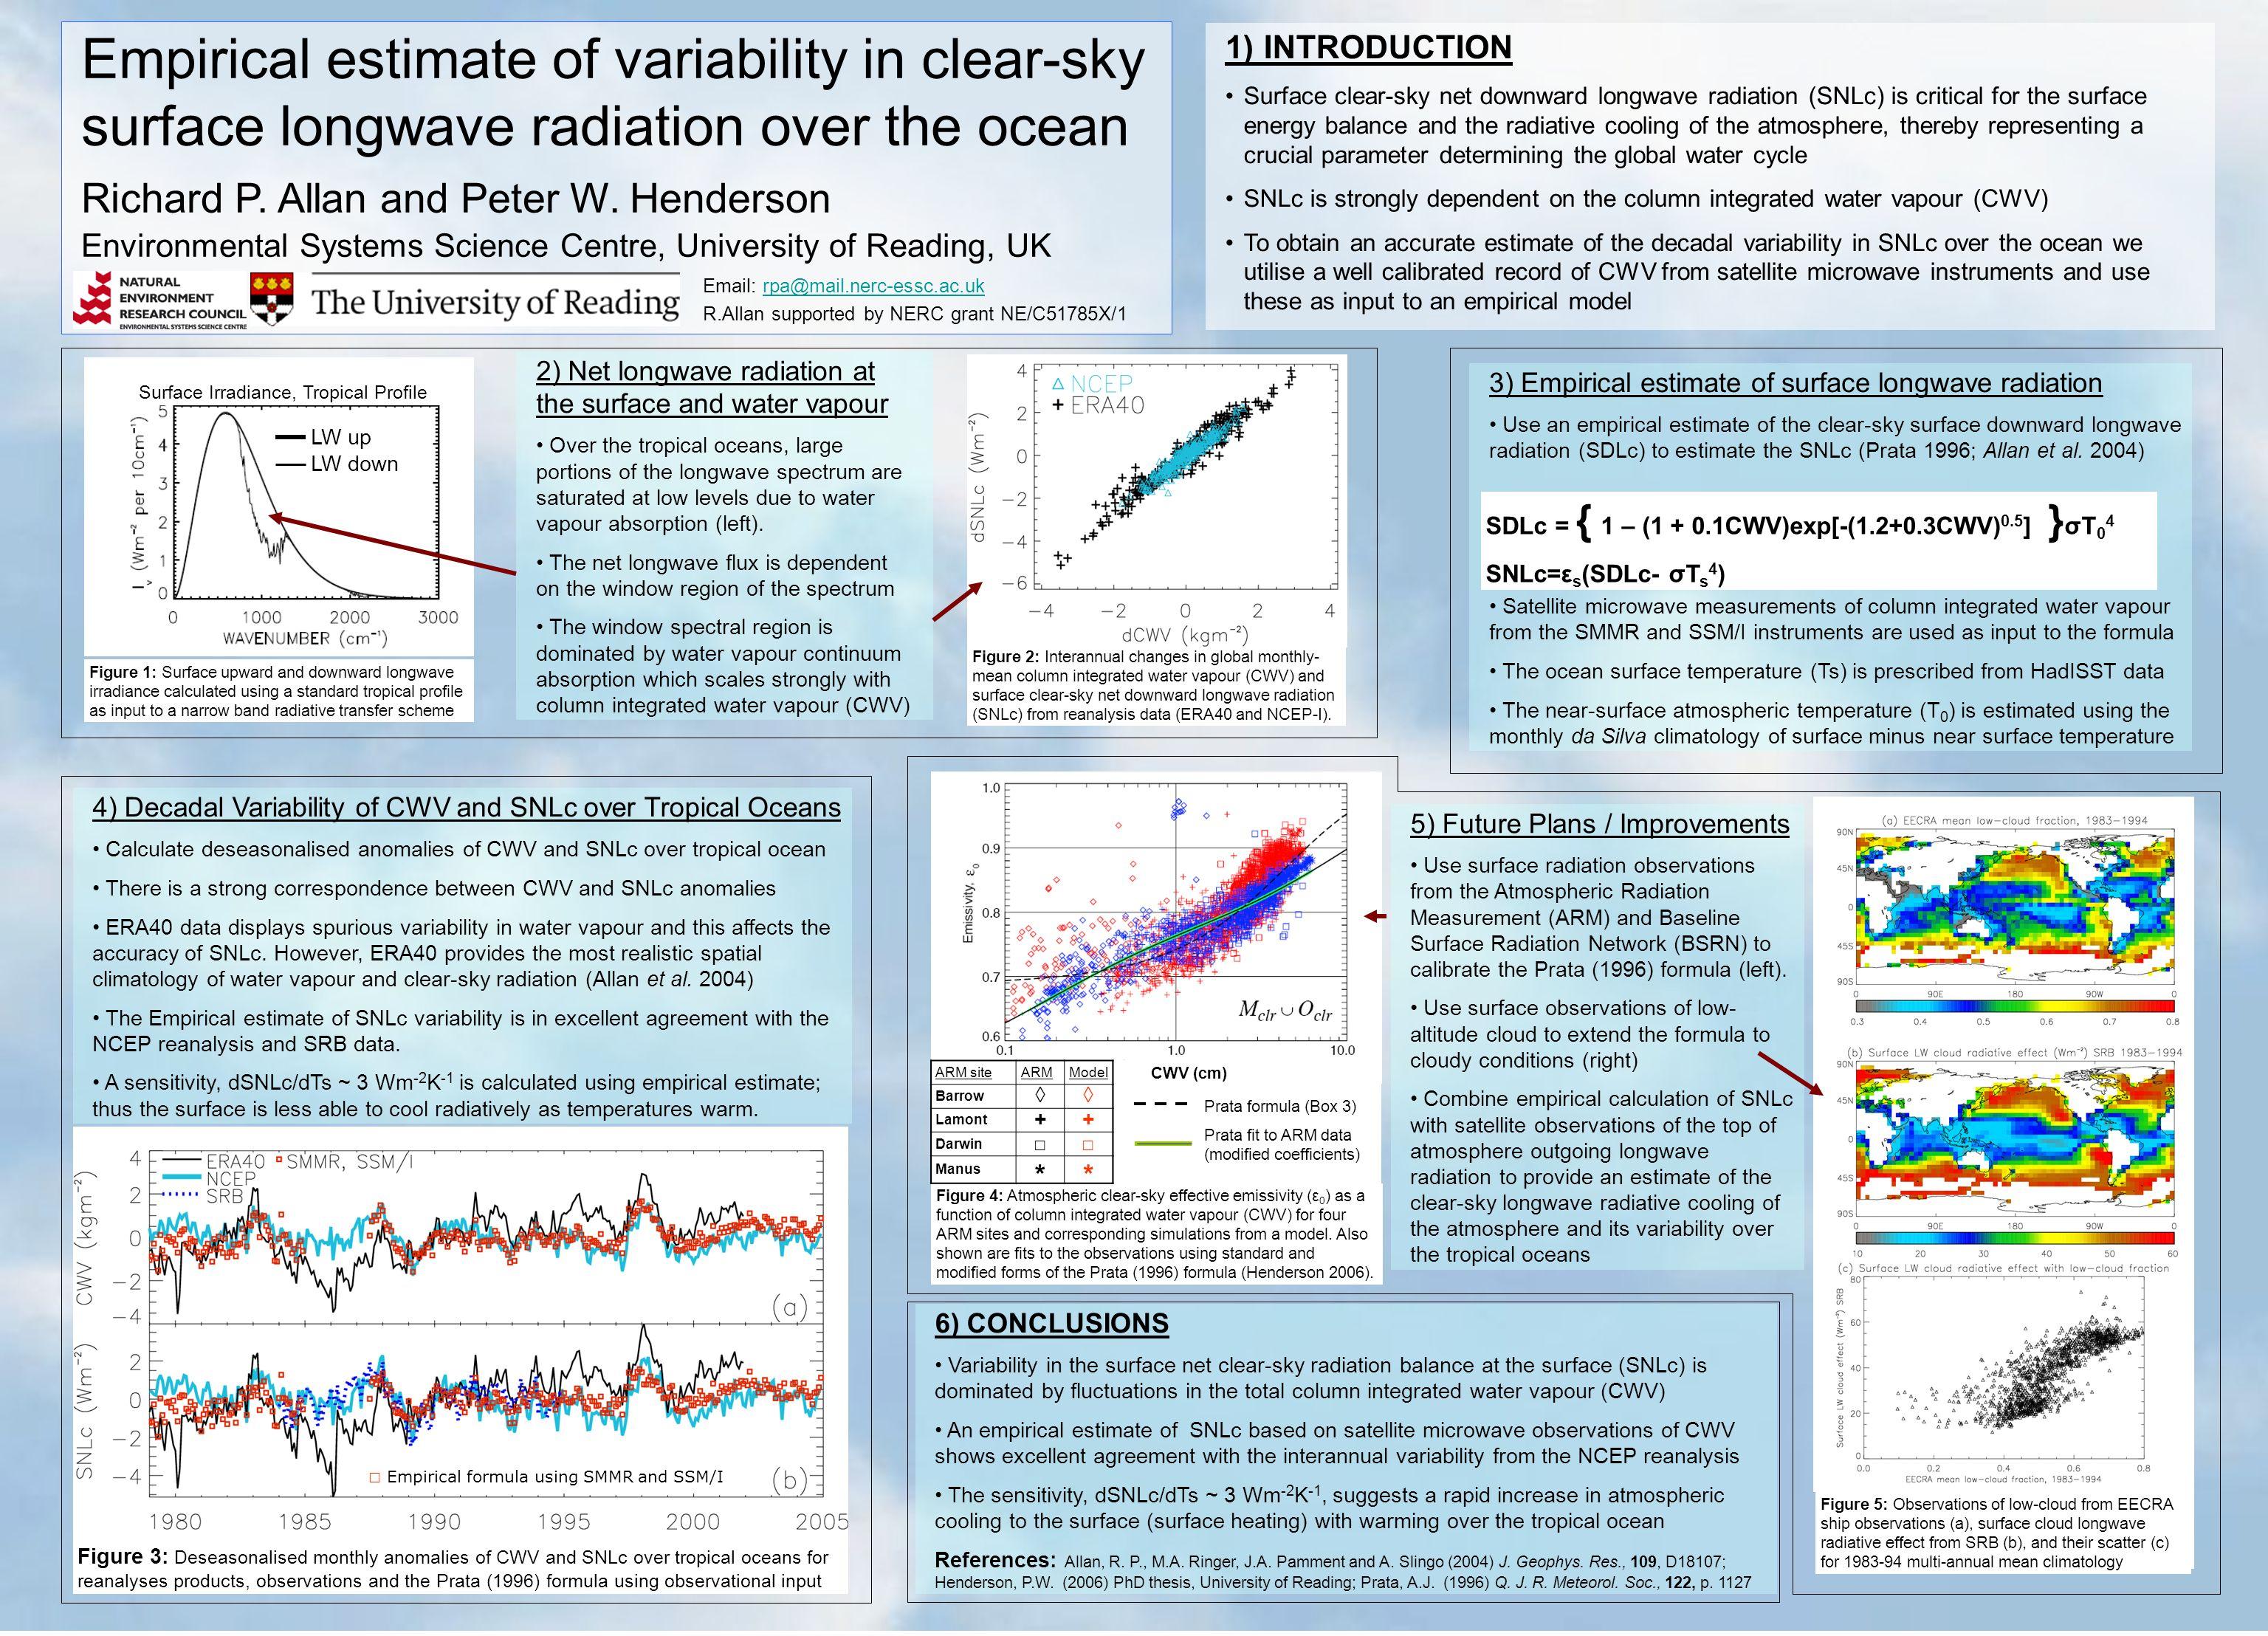 3) Empirical estimate of surface longwave radiation Use an empirical estimate of the clear-sky surface downward longwave radiation (SDLc) to estimate the SNLc (Prata 1996; Allan et al.